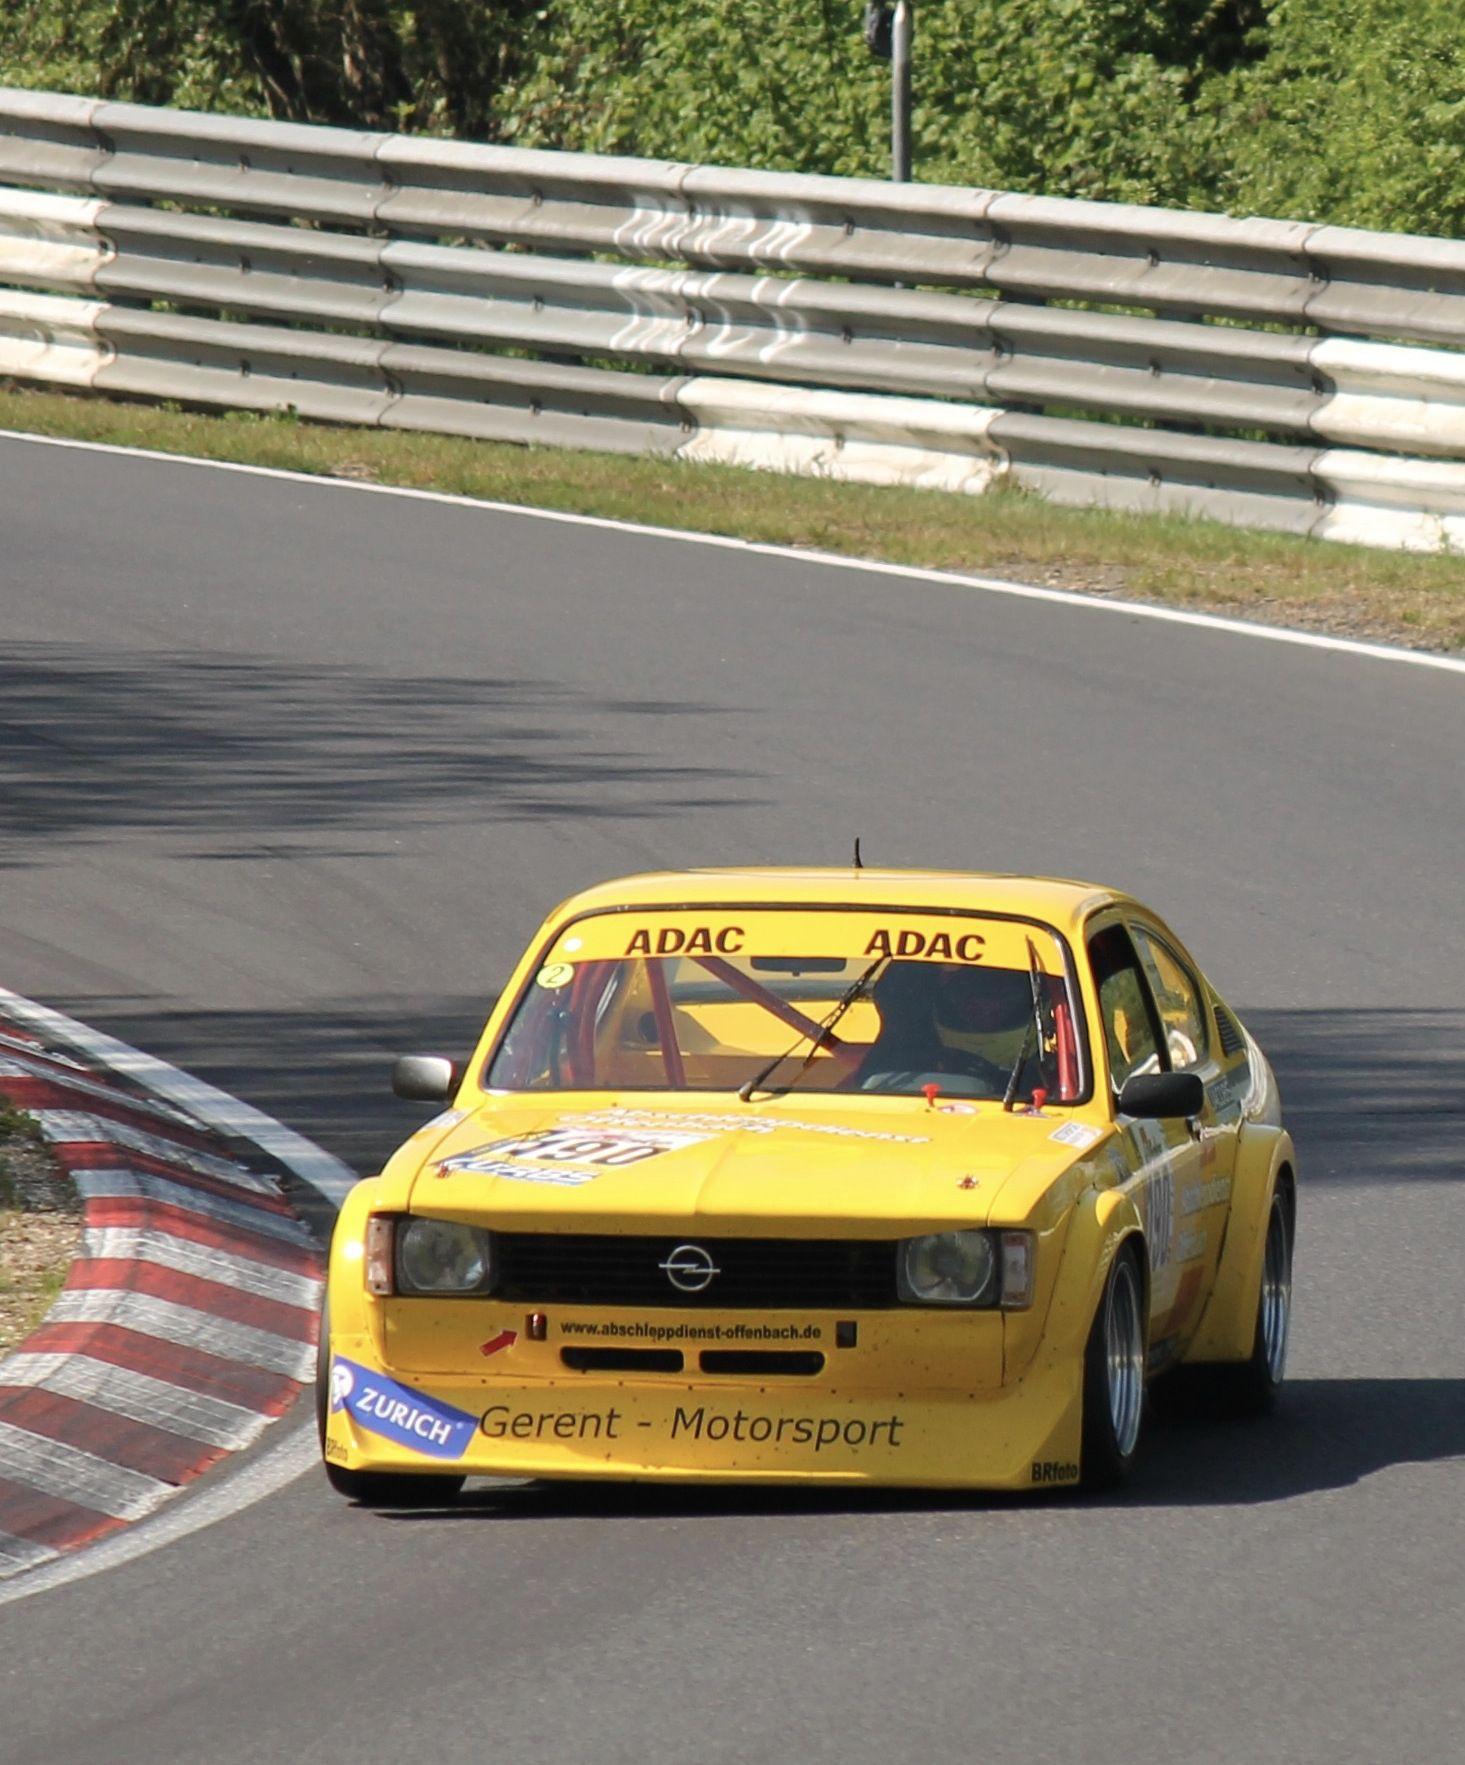 Opel Kadett C Coupé Klassische Wagen im Renneinsatz